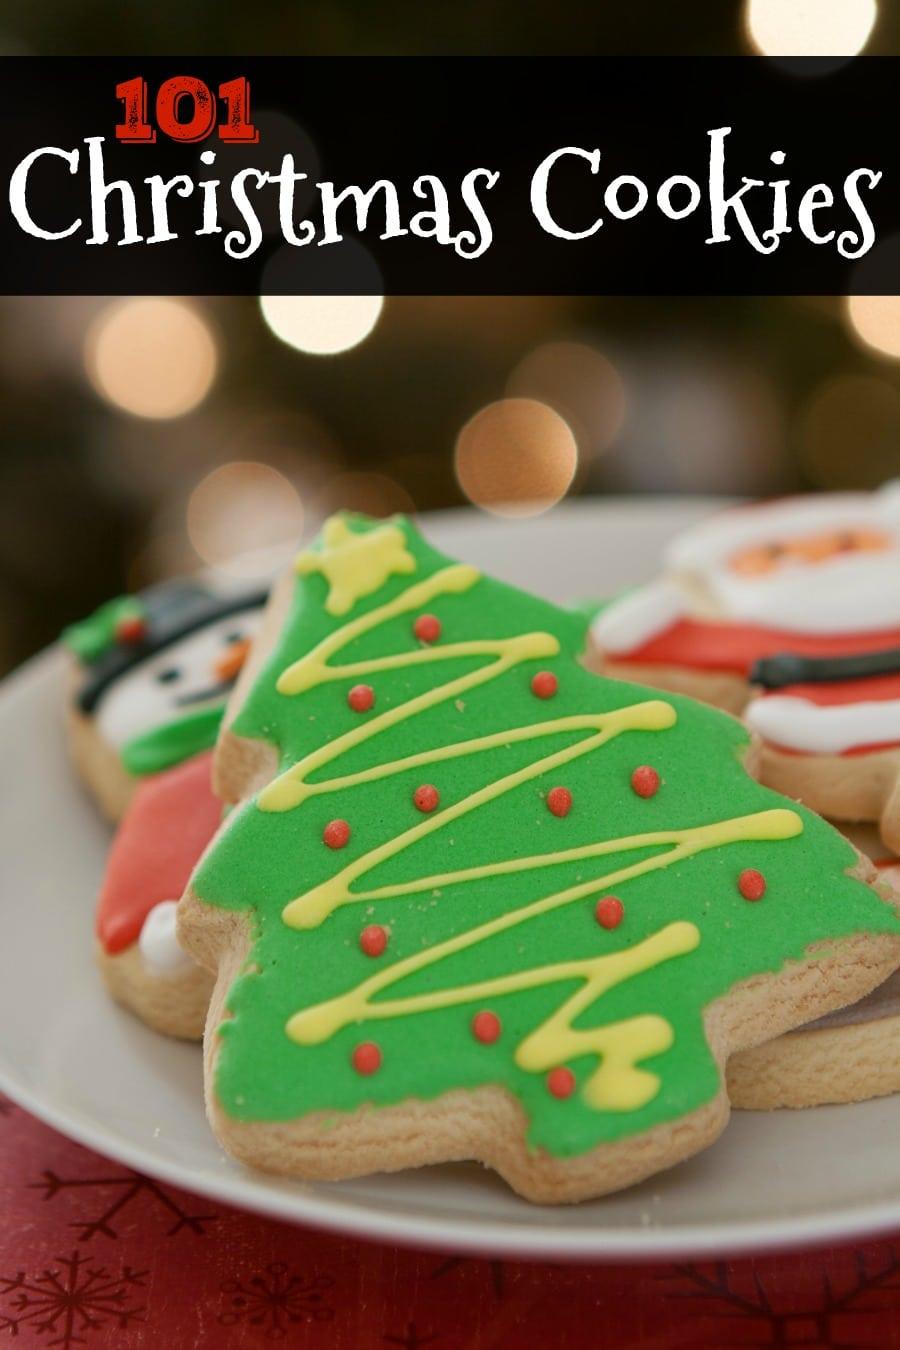 101 Christmas Cookies